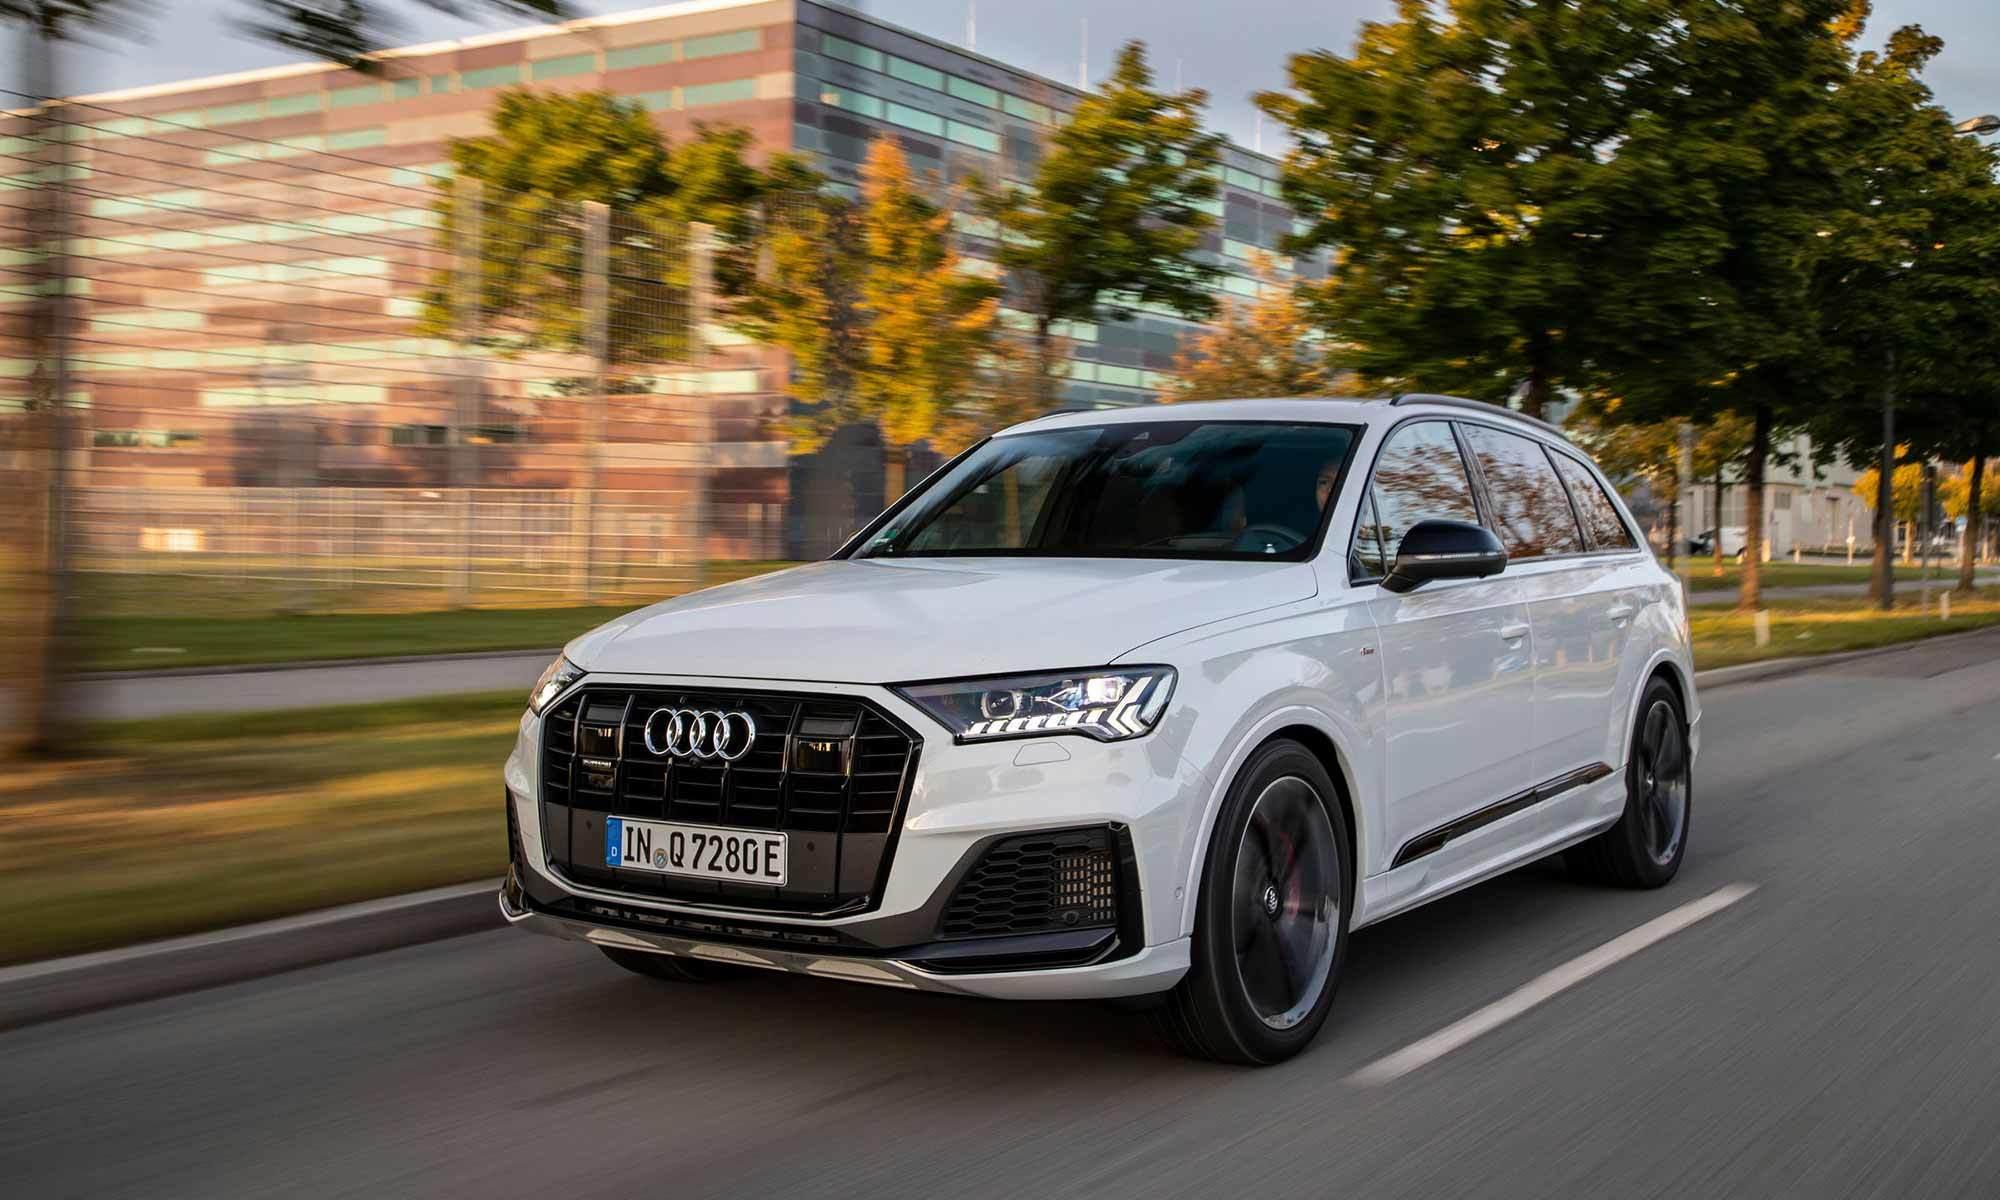 Audi Q7 Lifestyle Image